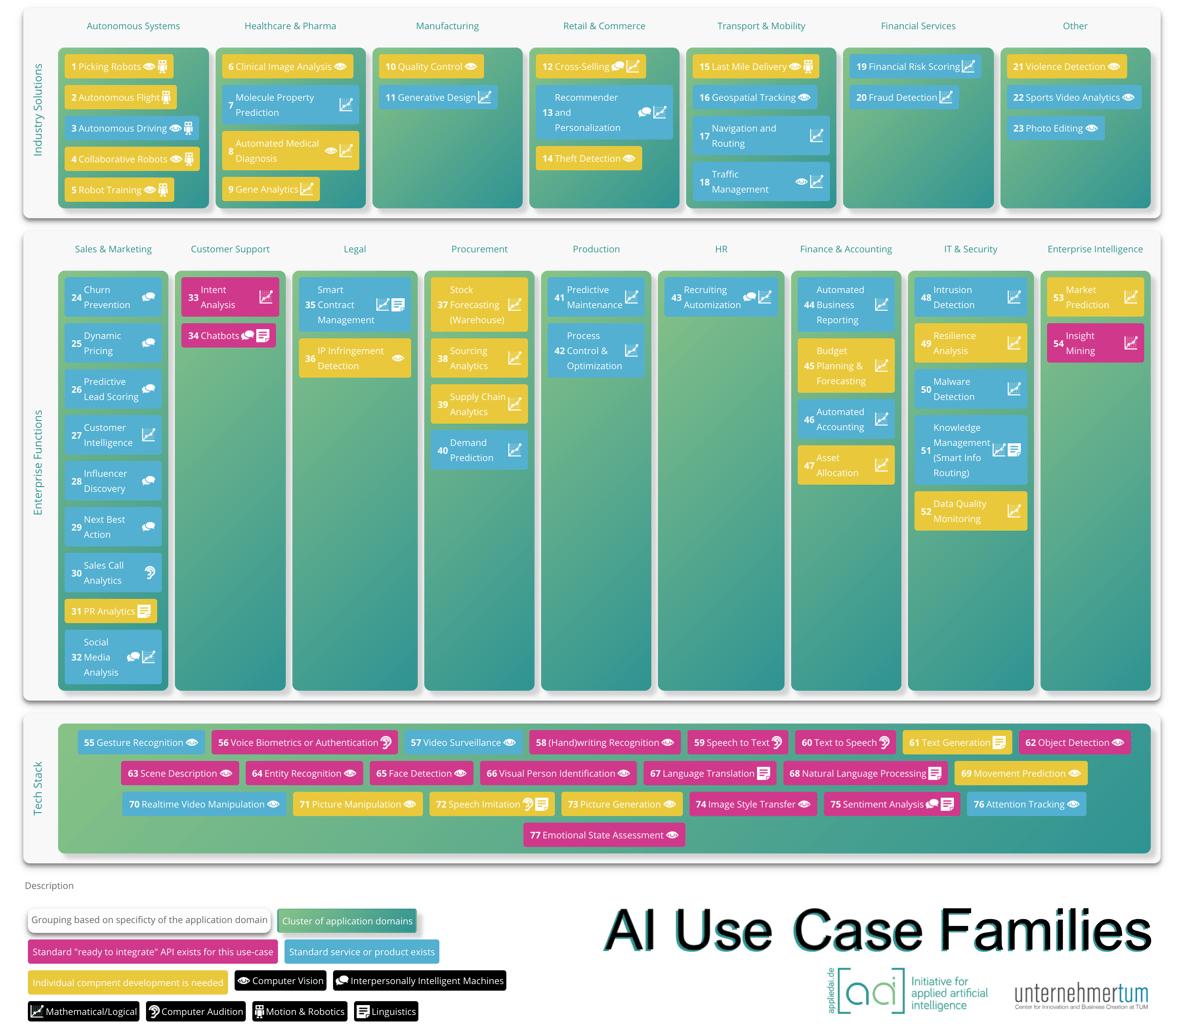 appliedAI_Use_Case_Families